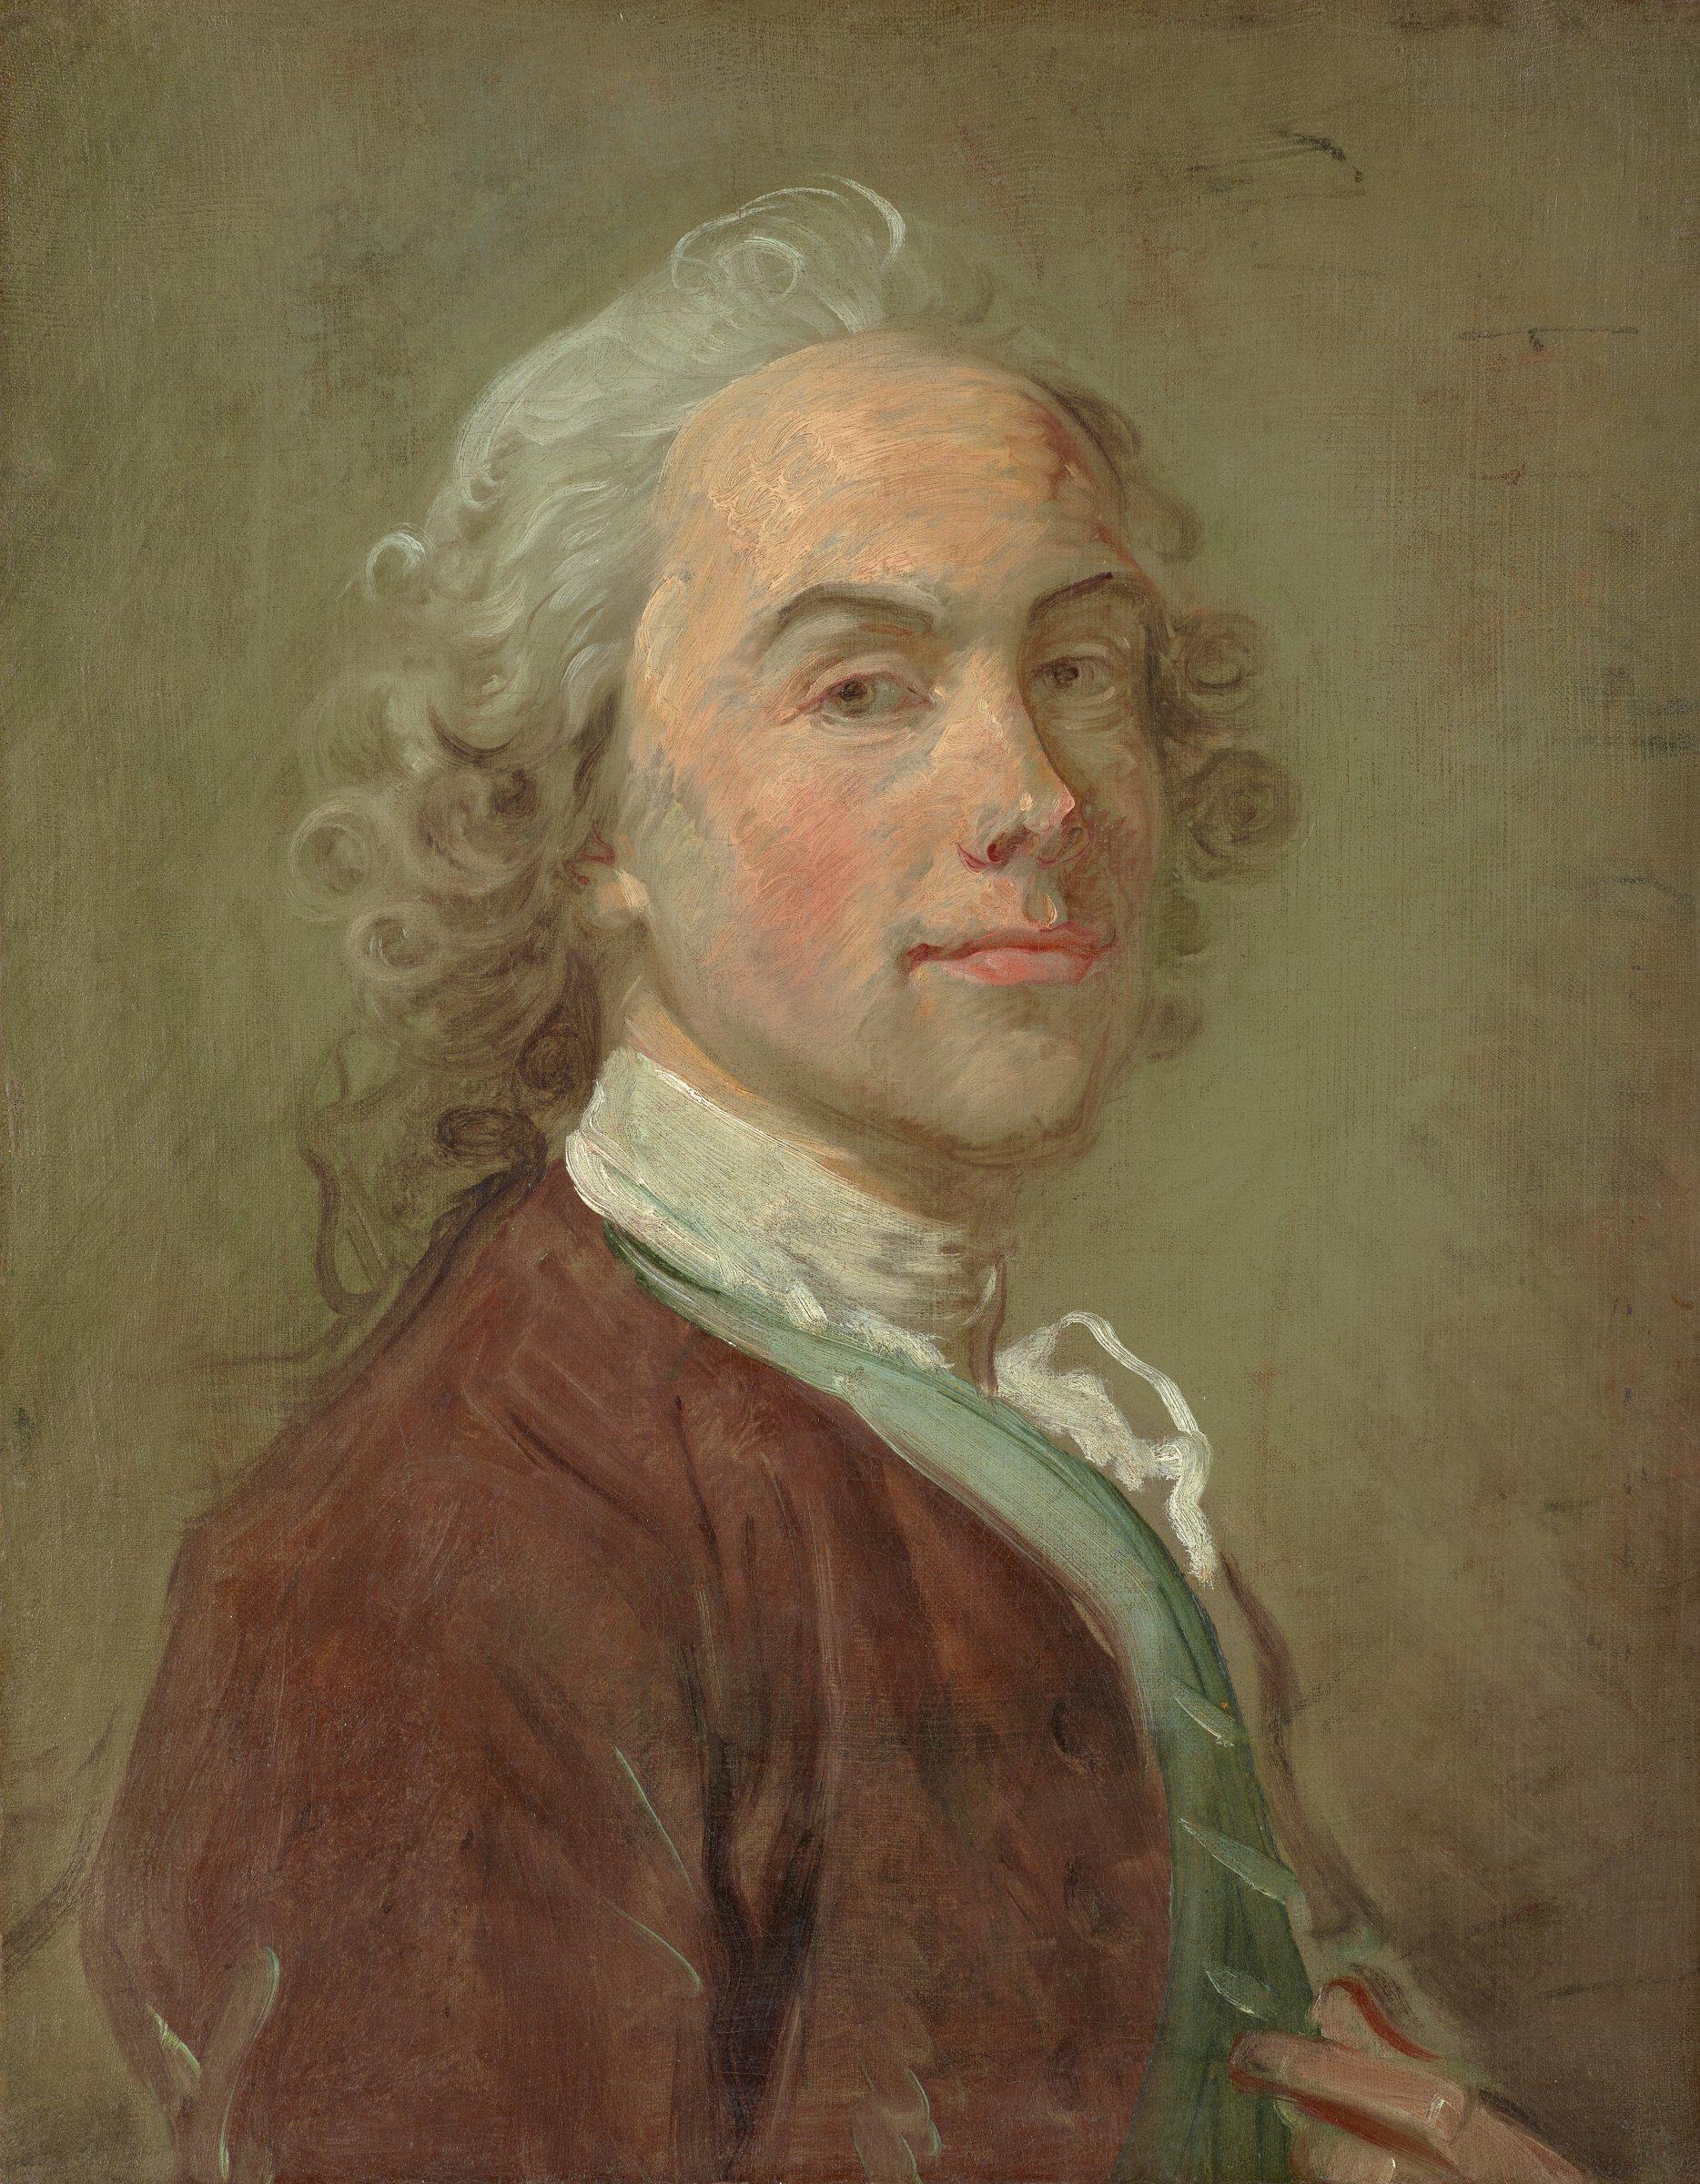 Portrait of a Gentleman (Self-Portrait?), Jean-Baptiste Perronneau, oil on canvas